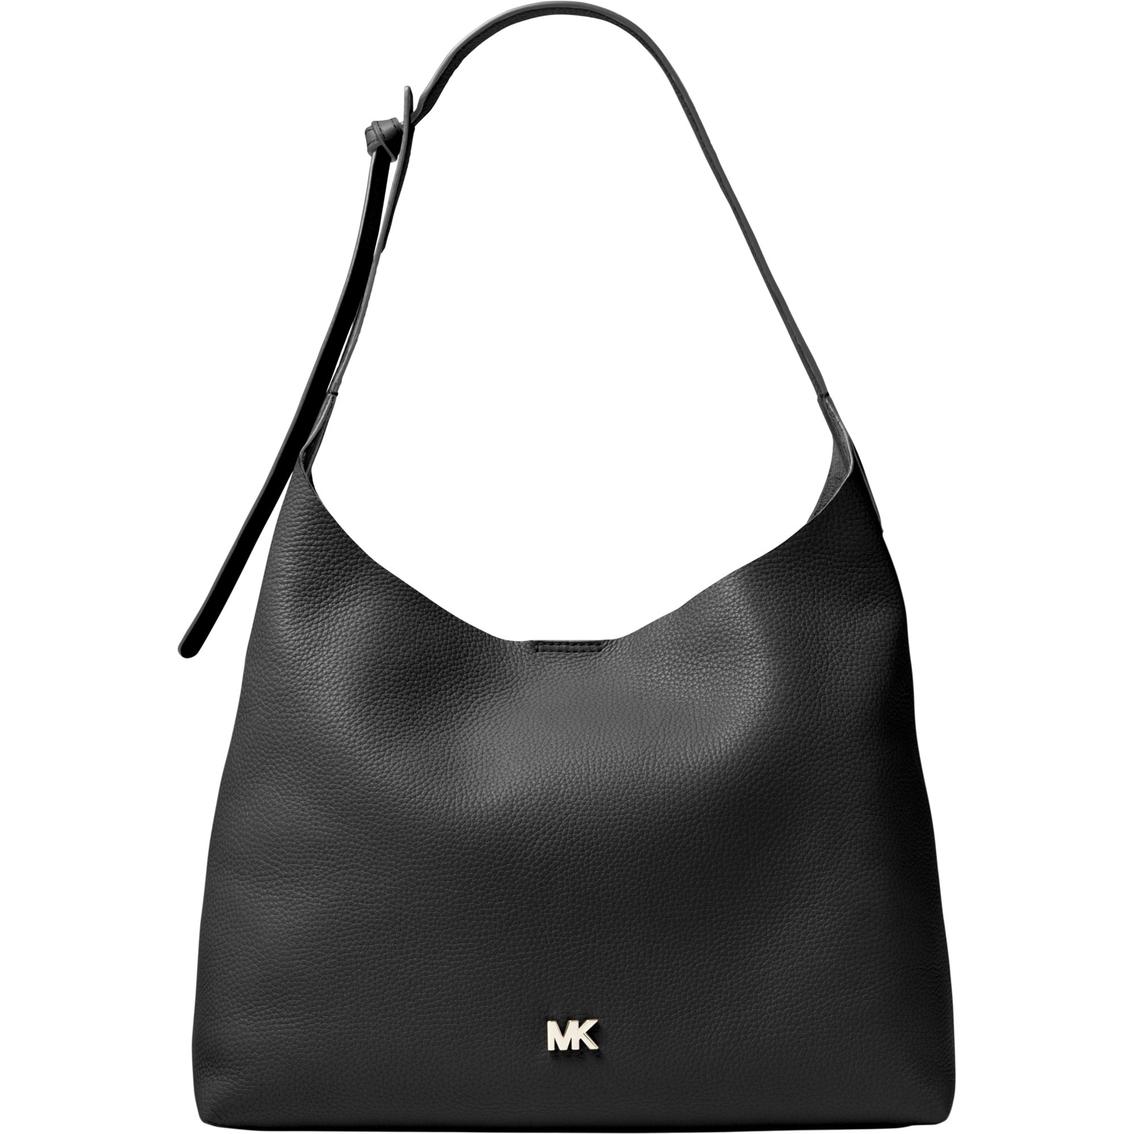 9f22f41af7 Michael Kors Junie Leather Medium Hobo Handbag